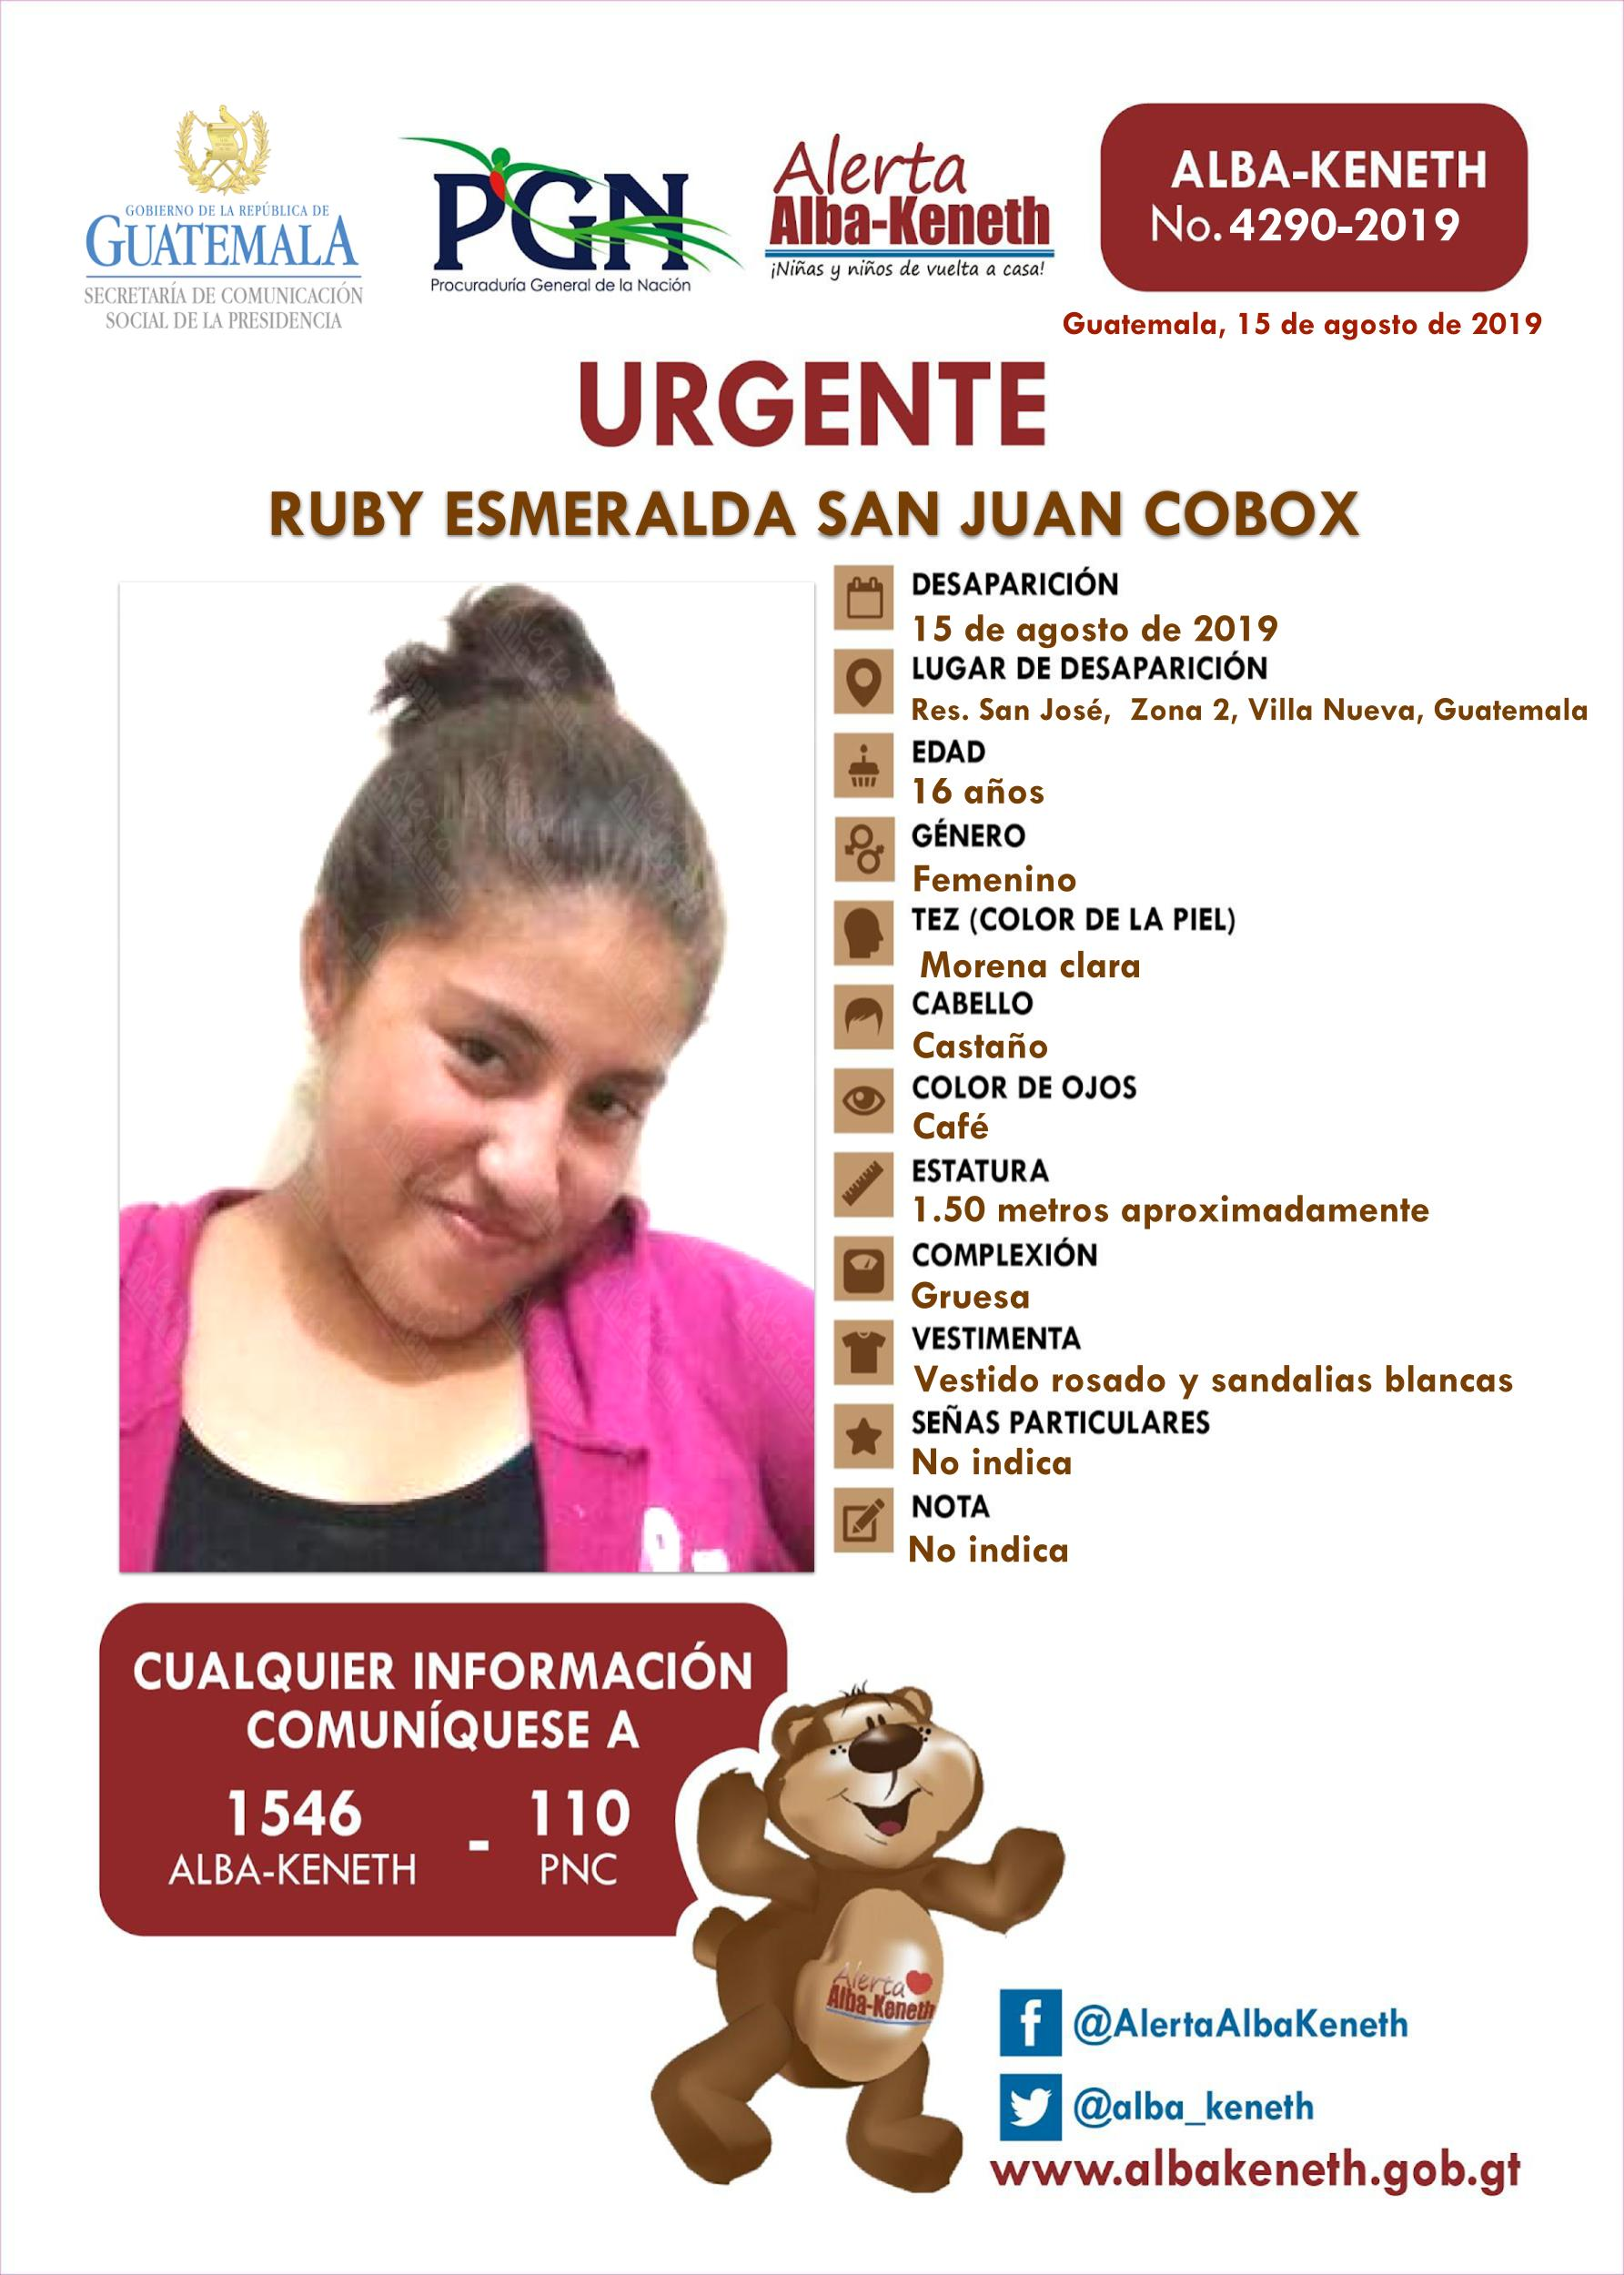 Ruby Esmeralda San Juan Cobox